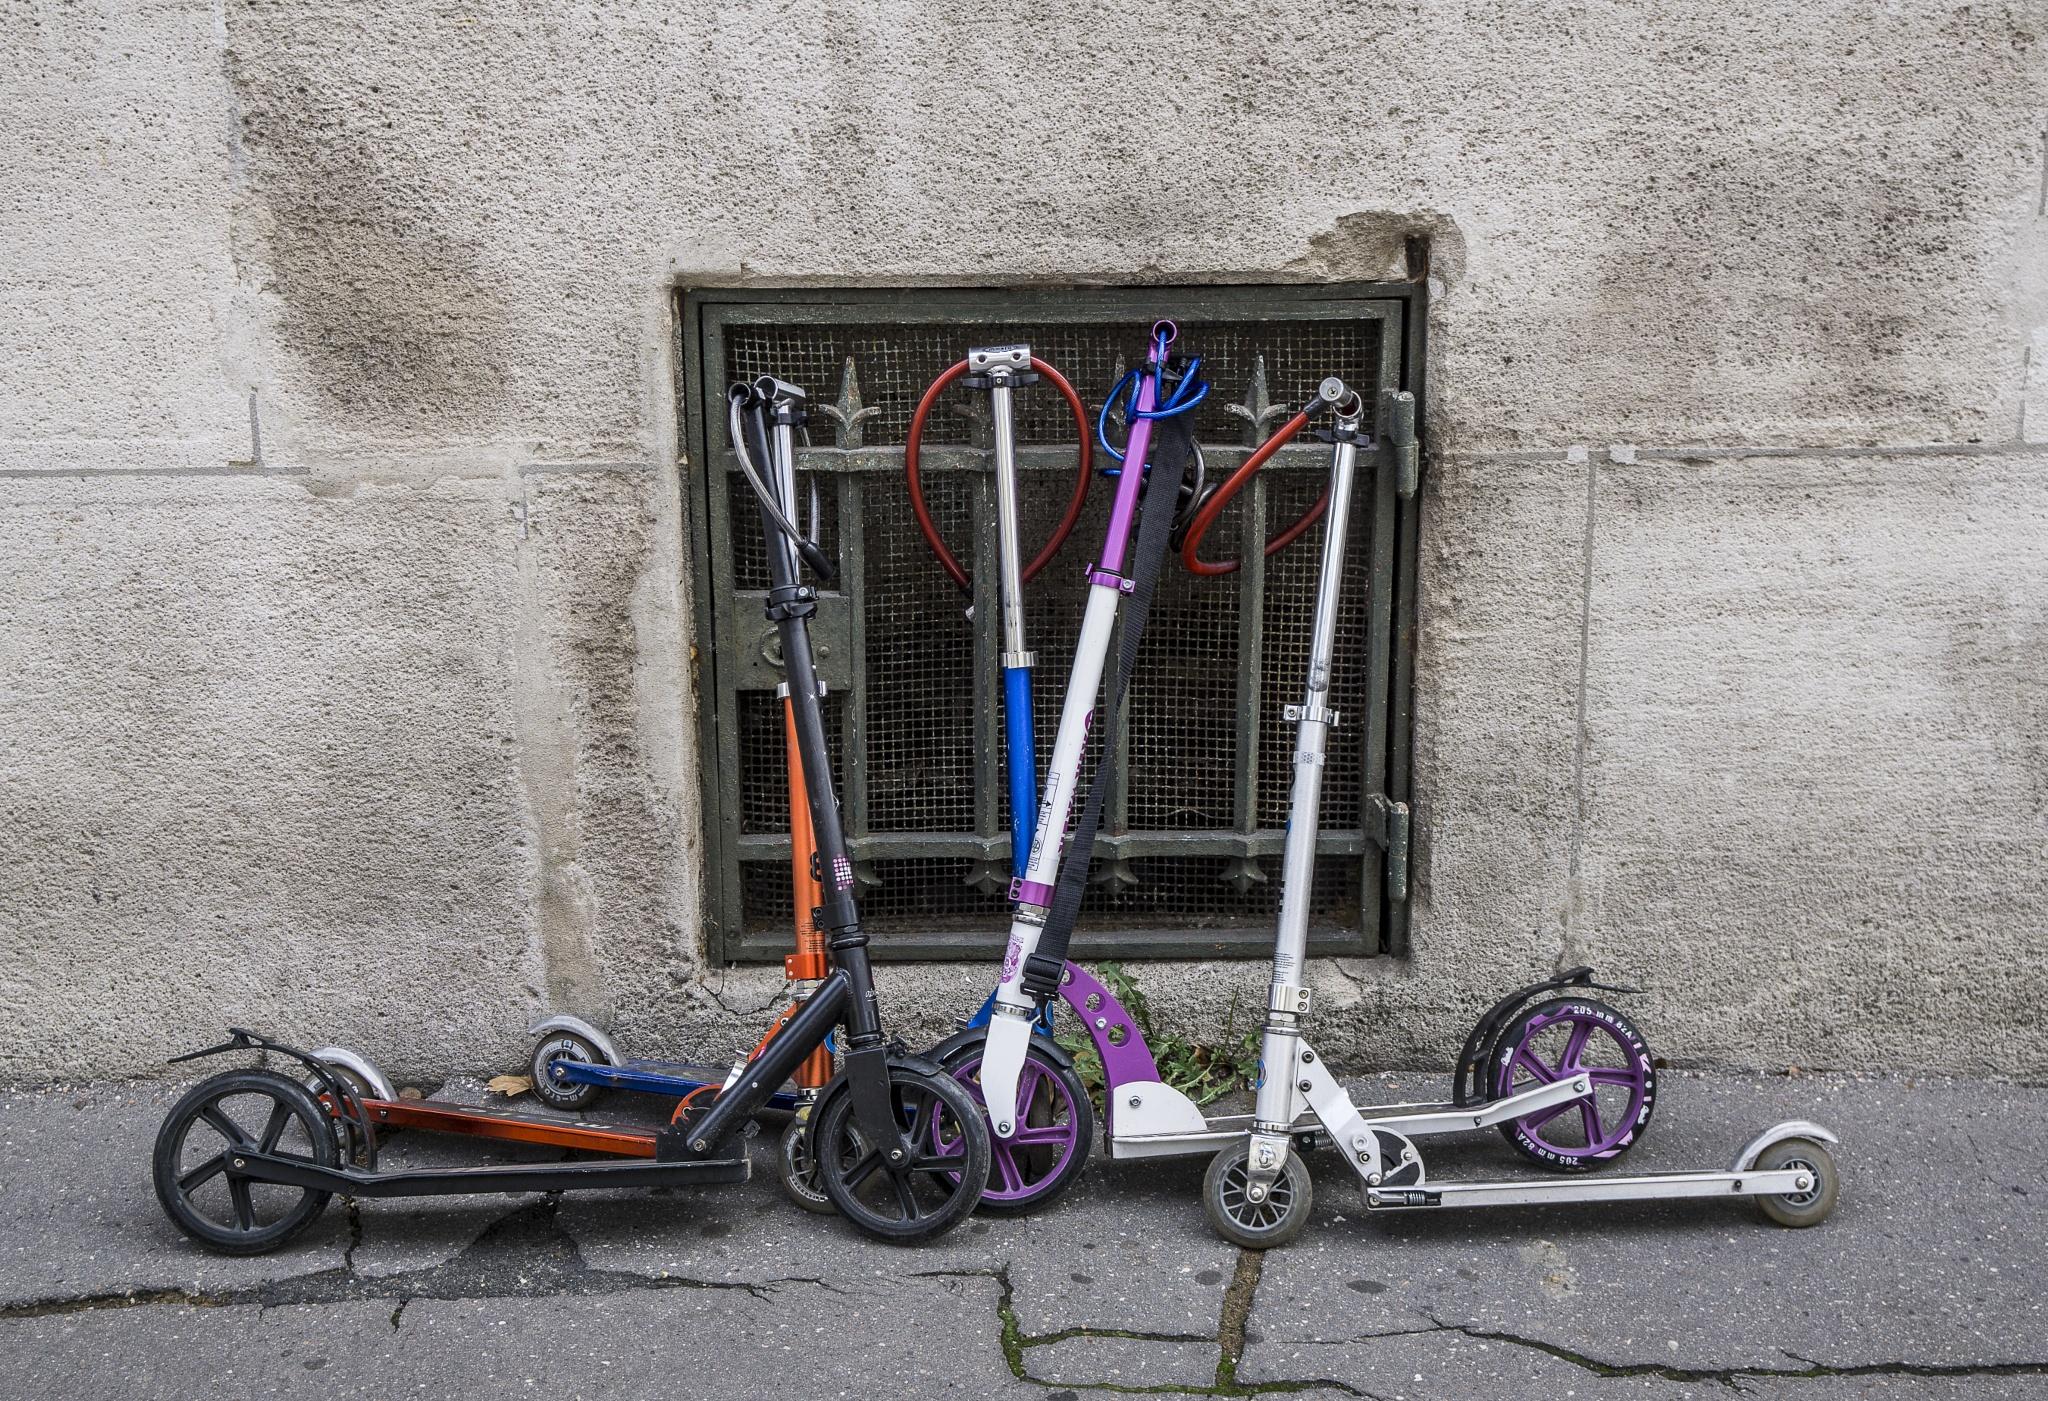 Scooters outside school, Paris by Chris Lane